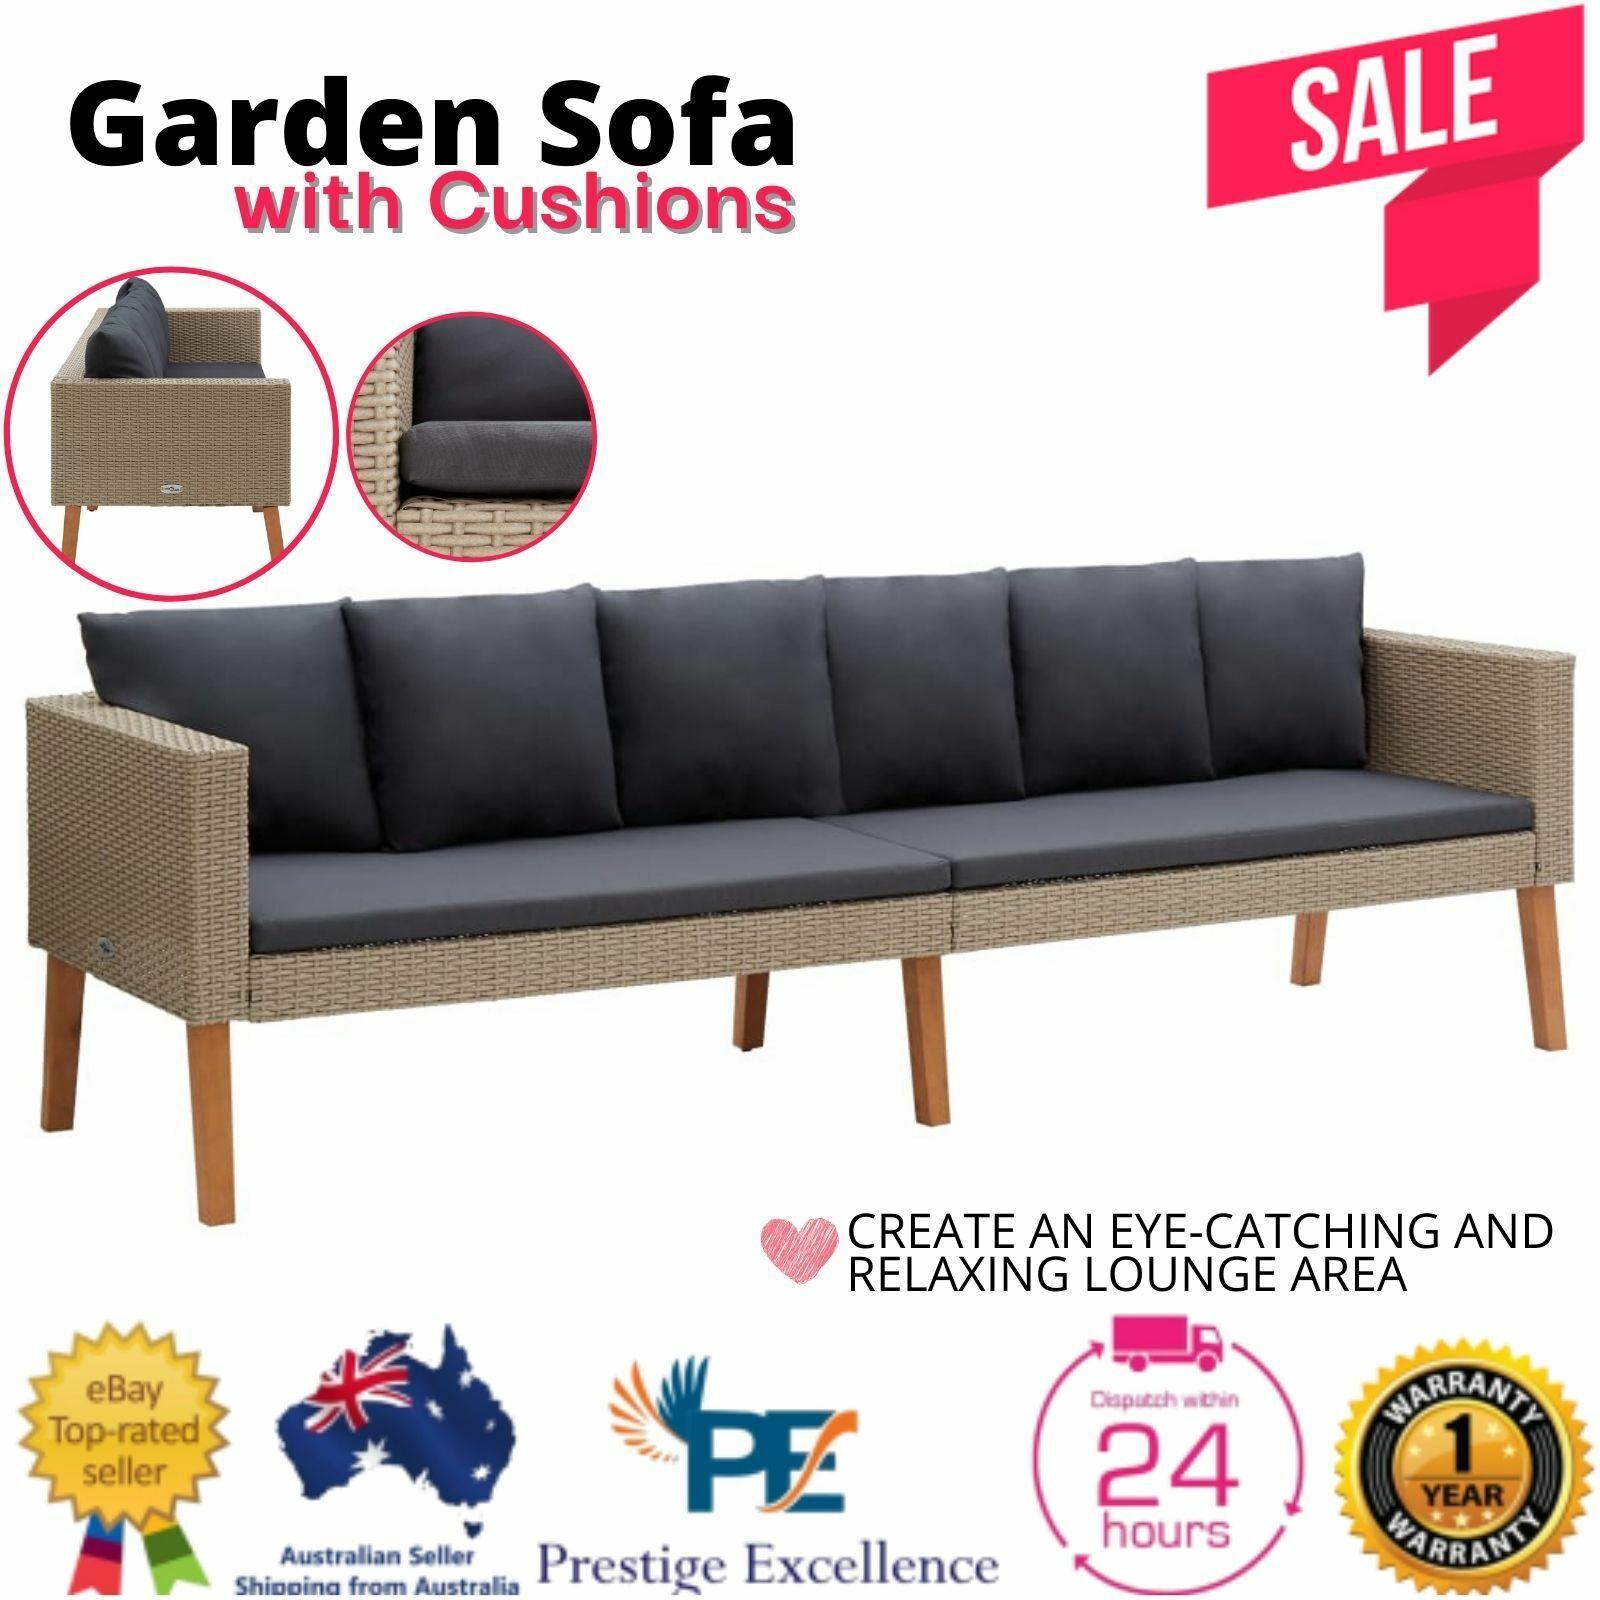 Garden Furniture - Garden Sofa Outdoor Furniture Lounge PE Wicker Rattan Setting Chair Couch Beige